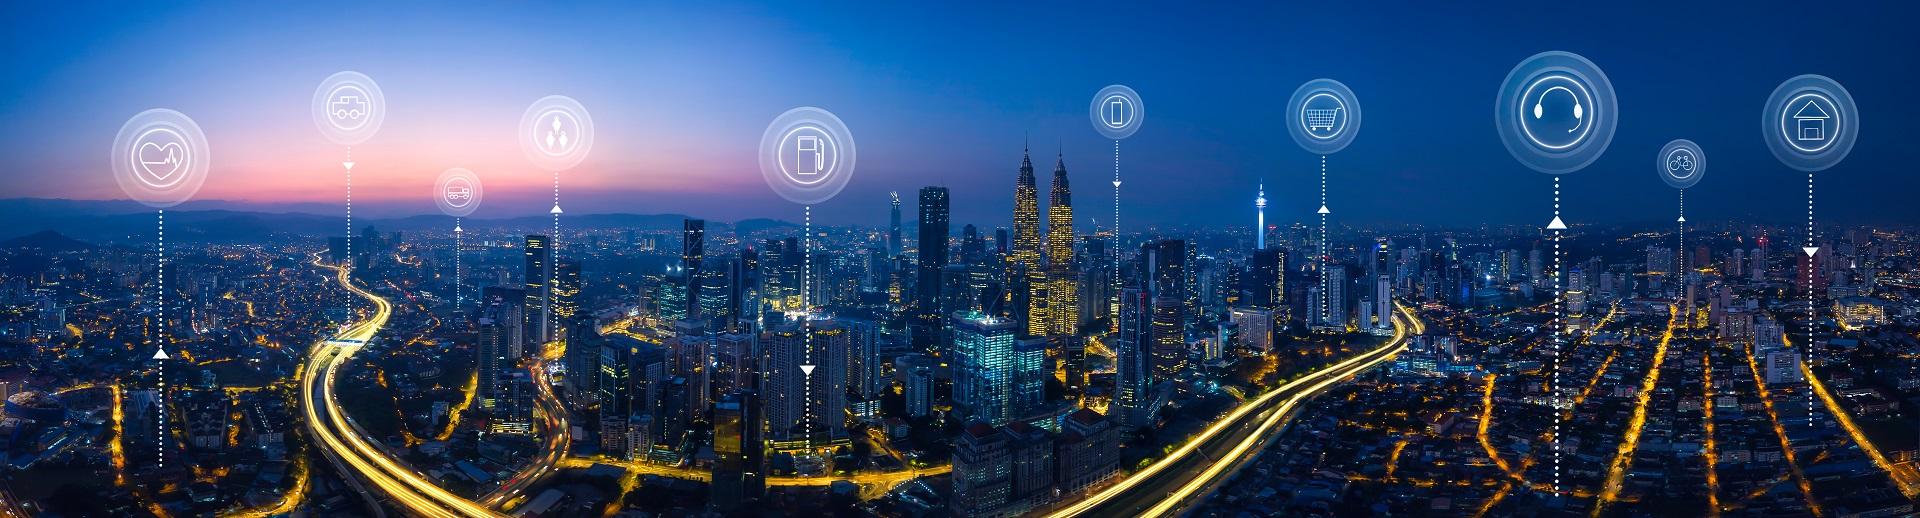 Smart City : Projet d'innovation phare des métropoles